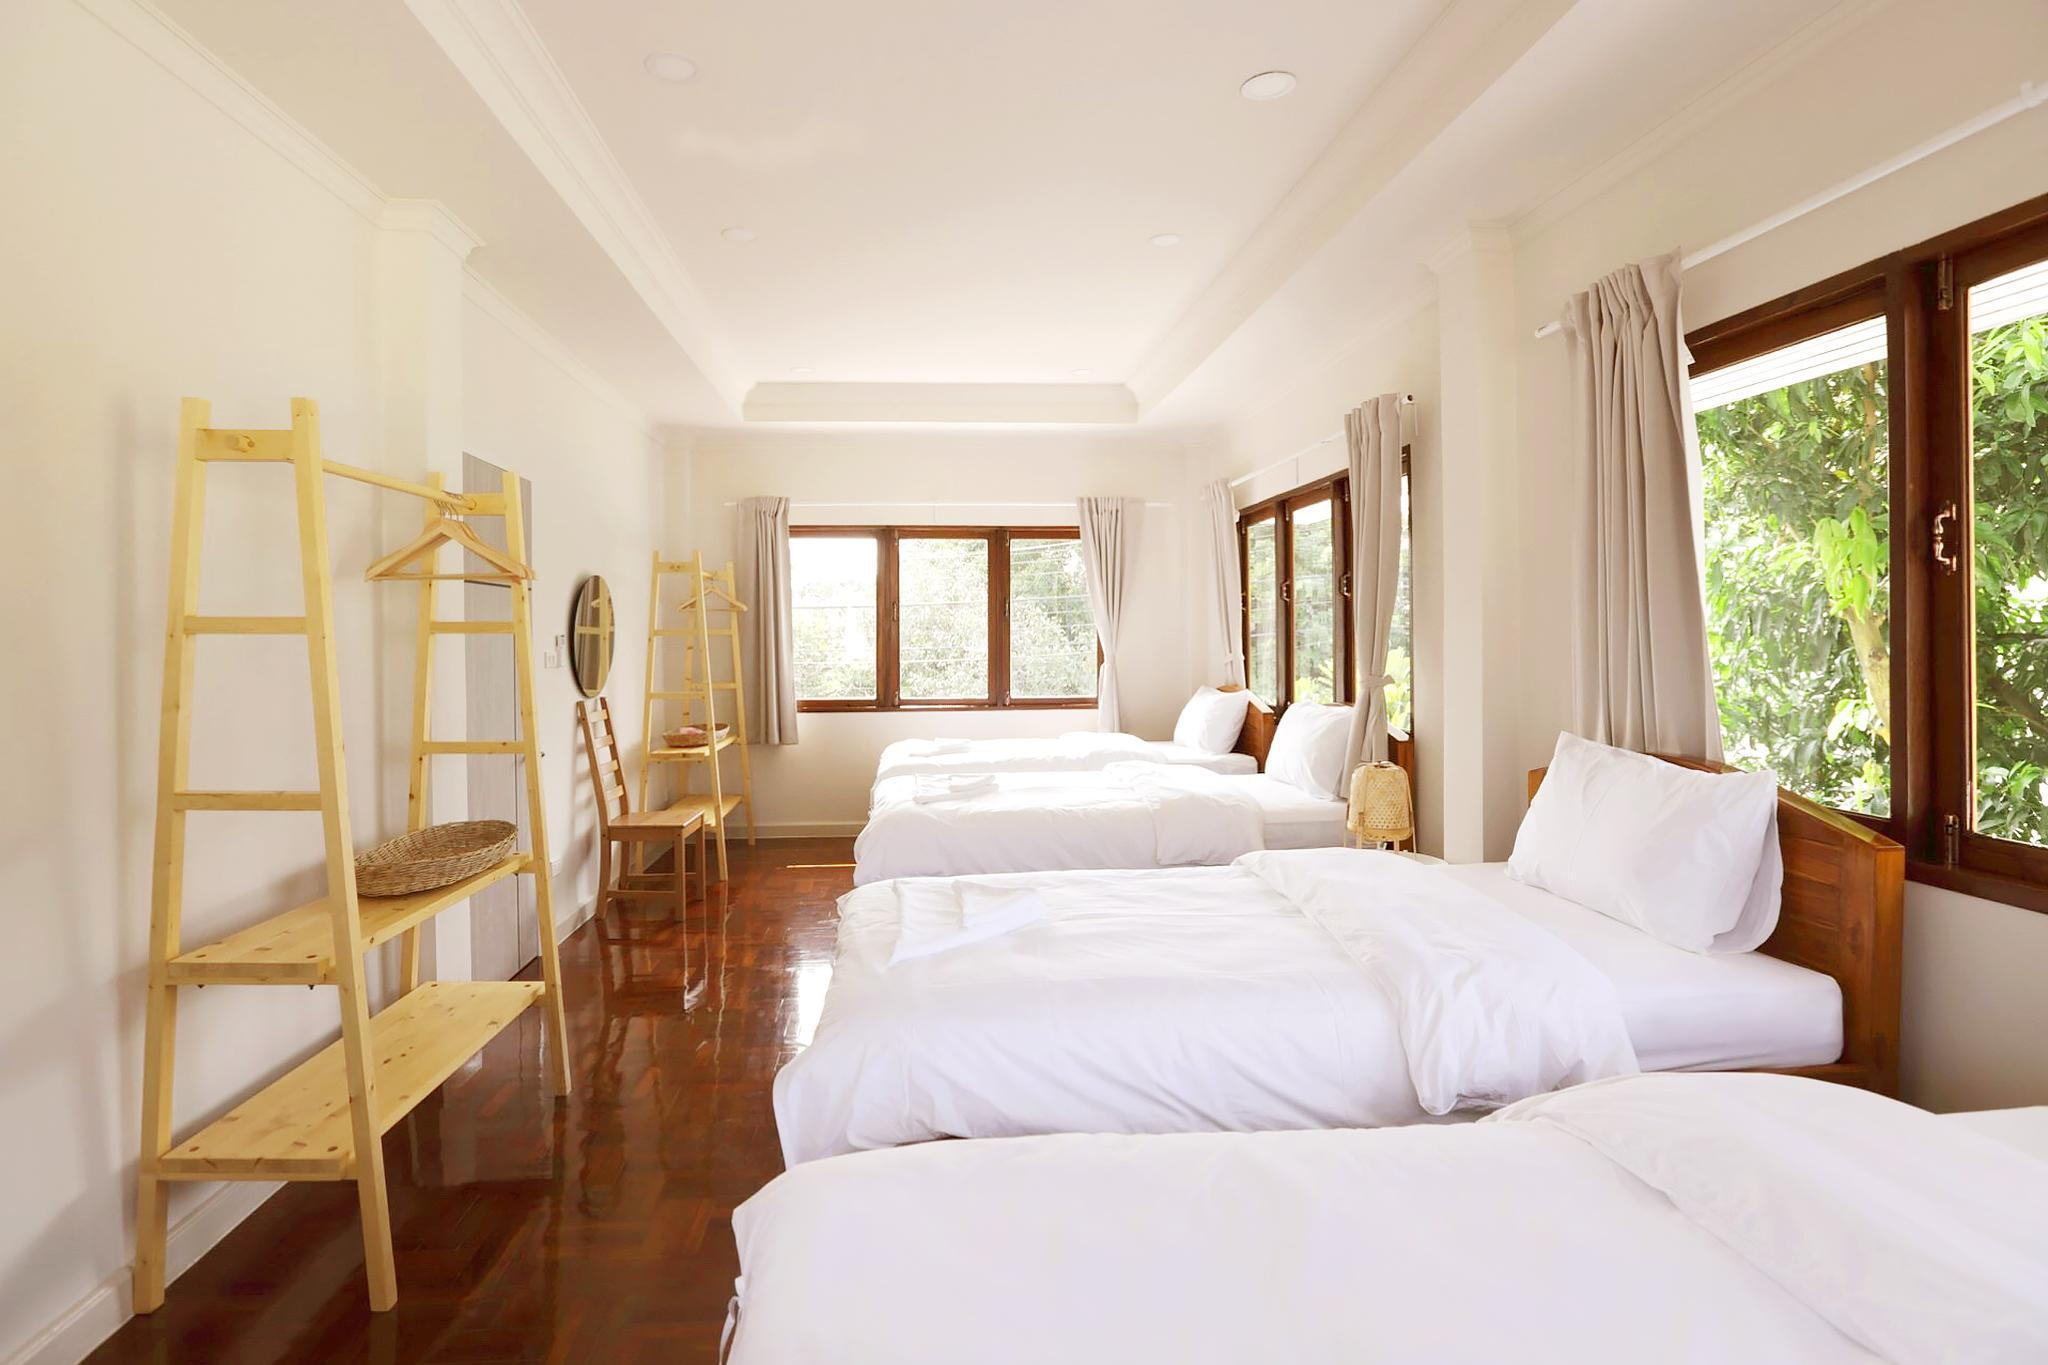 Relaxing Private house in Ayutthaya old city บ้านเดี่ยว 4 ห้องนอน 2 ห้องน้ำส่วนตัว ขนาด 120 ตร.ม. – คลองสวนพลู